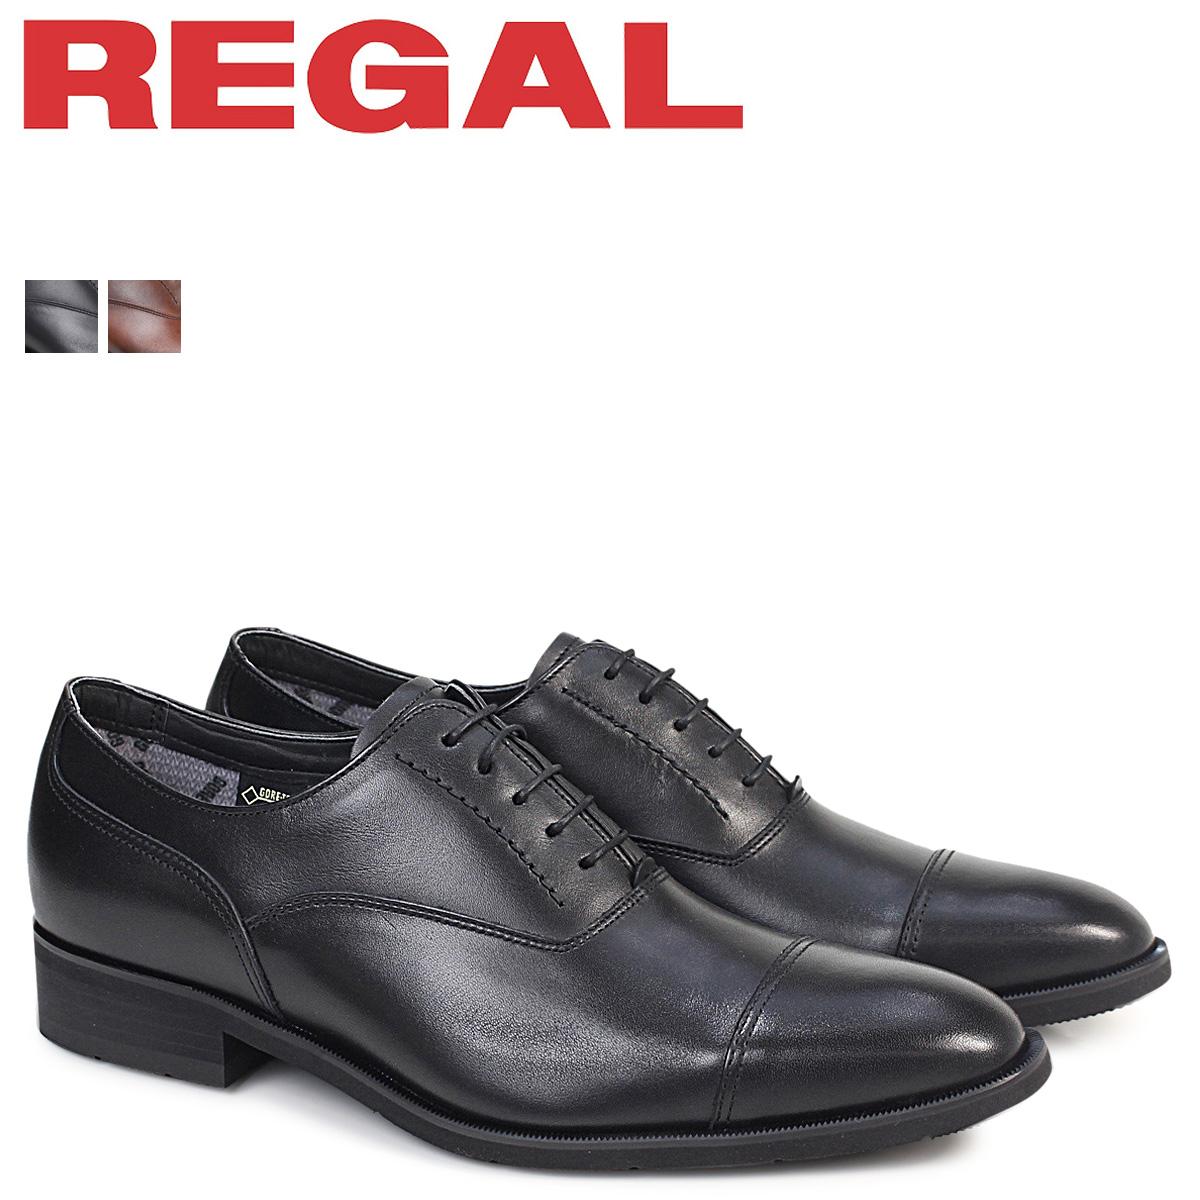 REGAL 靴 メンズ リーガル ストレートチップ 35HRBB ビジネスシューズ 防水 日本製 [9/12 追加入荷]